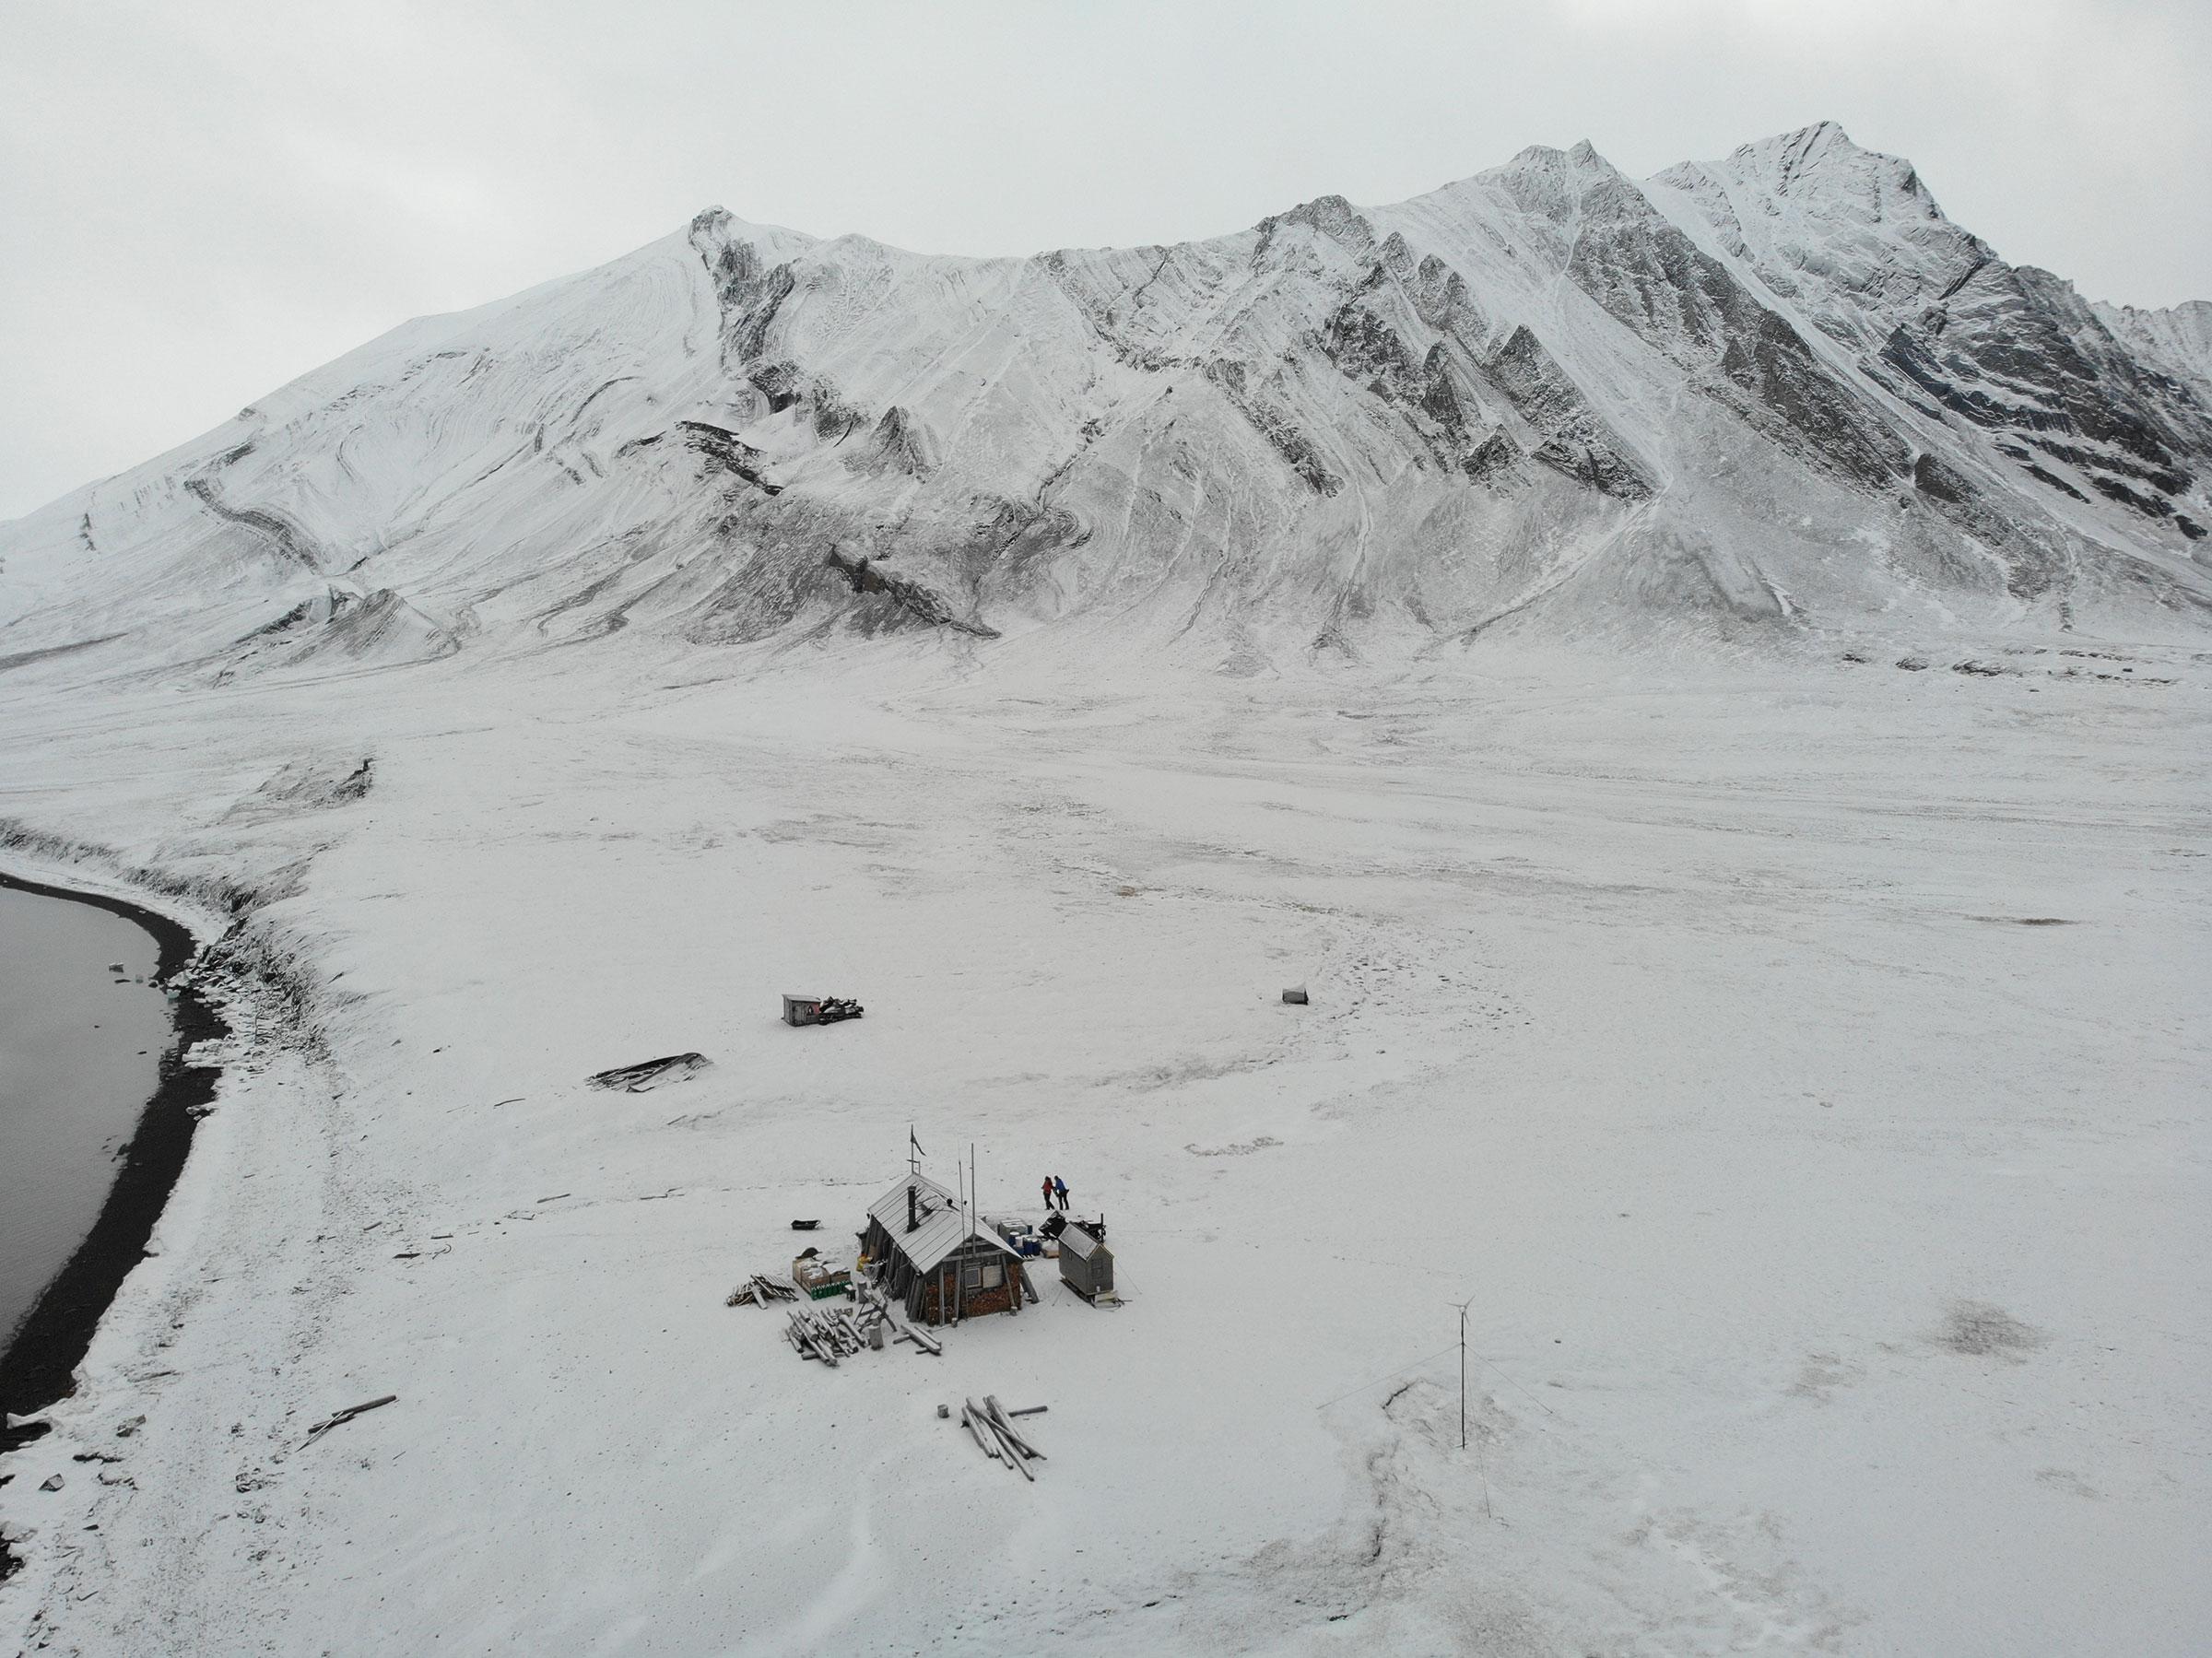 Bamsebu Trappers Cabin built in 1930 for Beluga hunting, March 2020